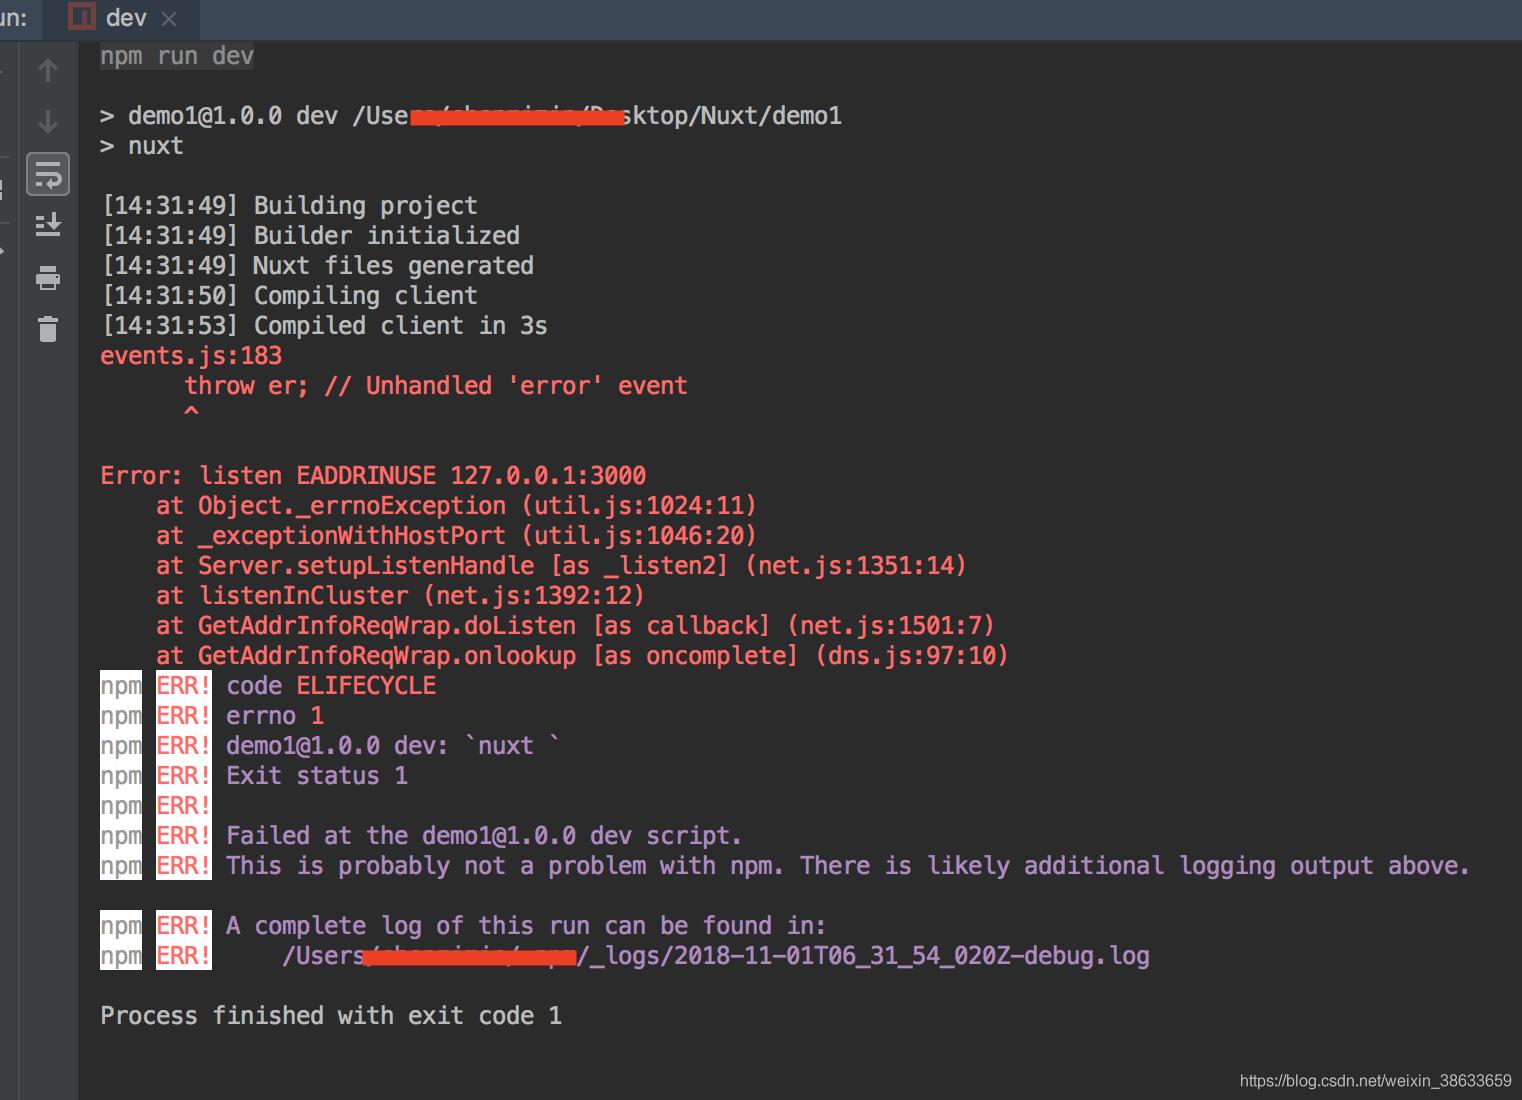 nuxt安装与IP端口配置- chenzimin_blog - CSDN博客